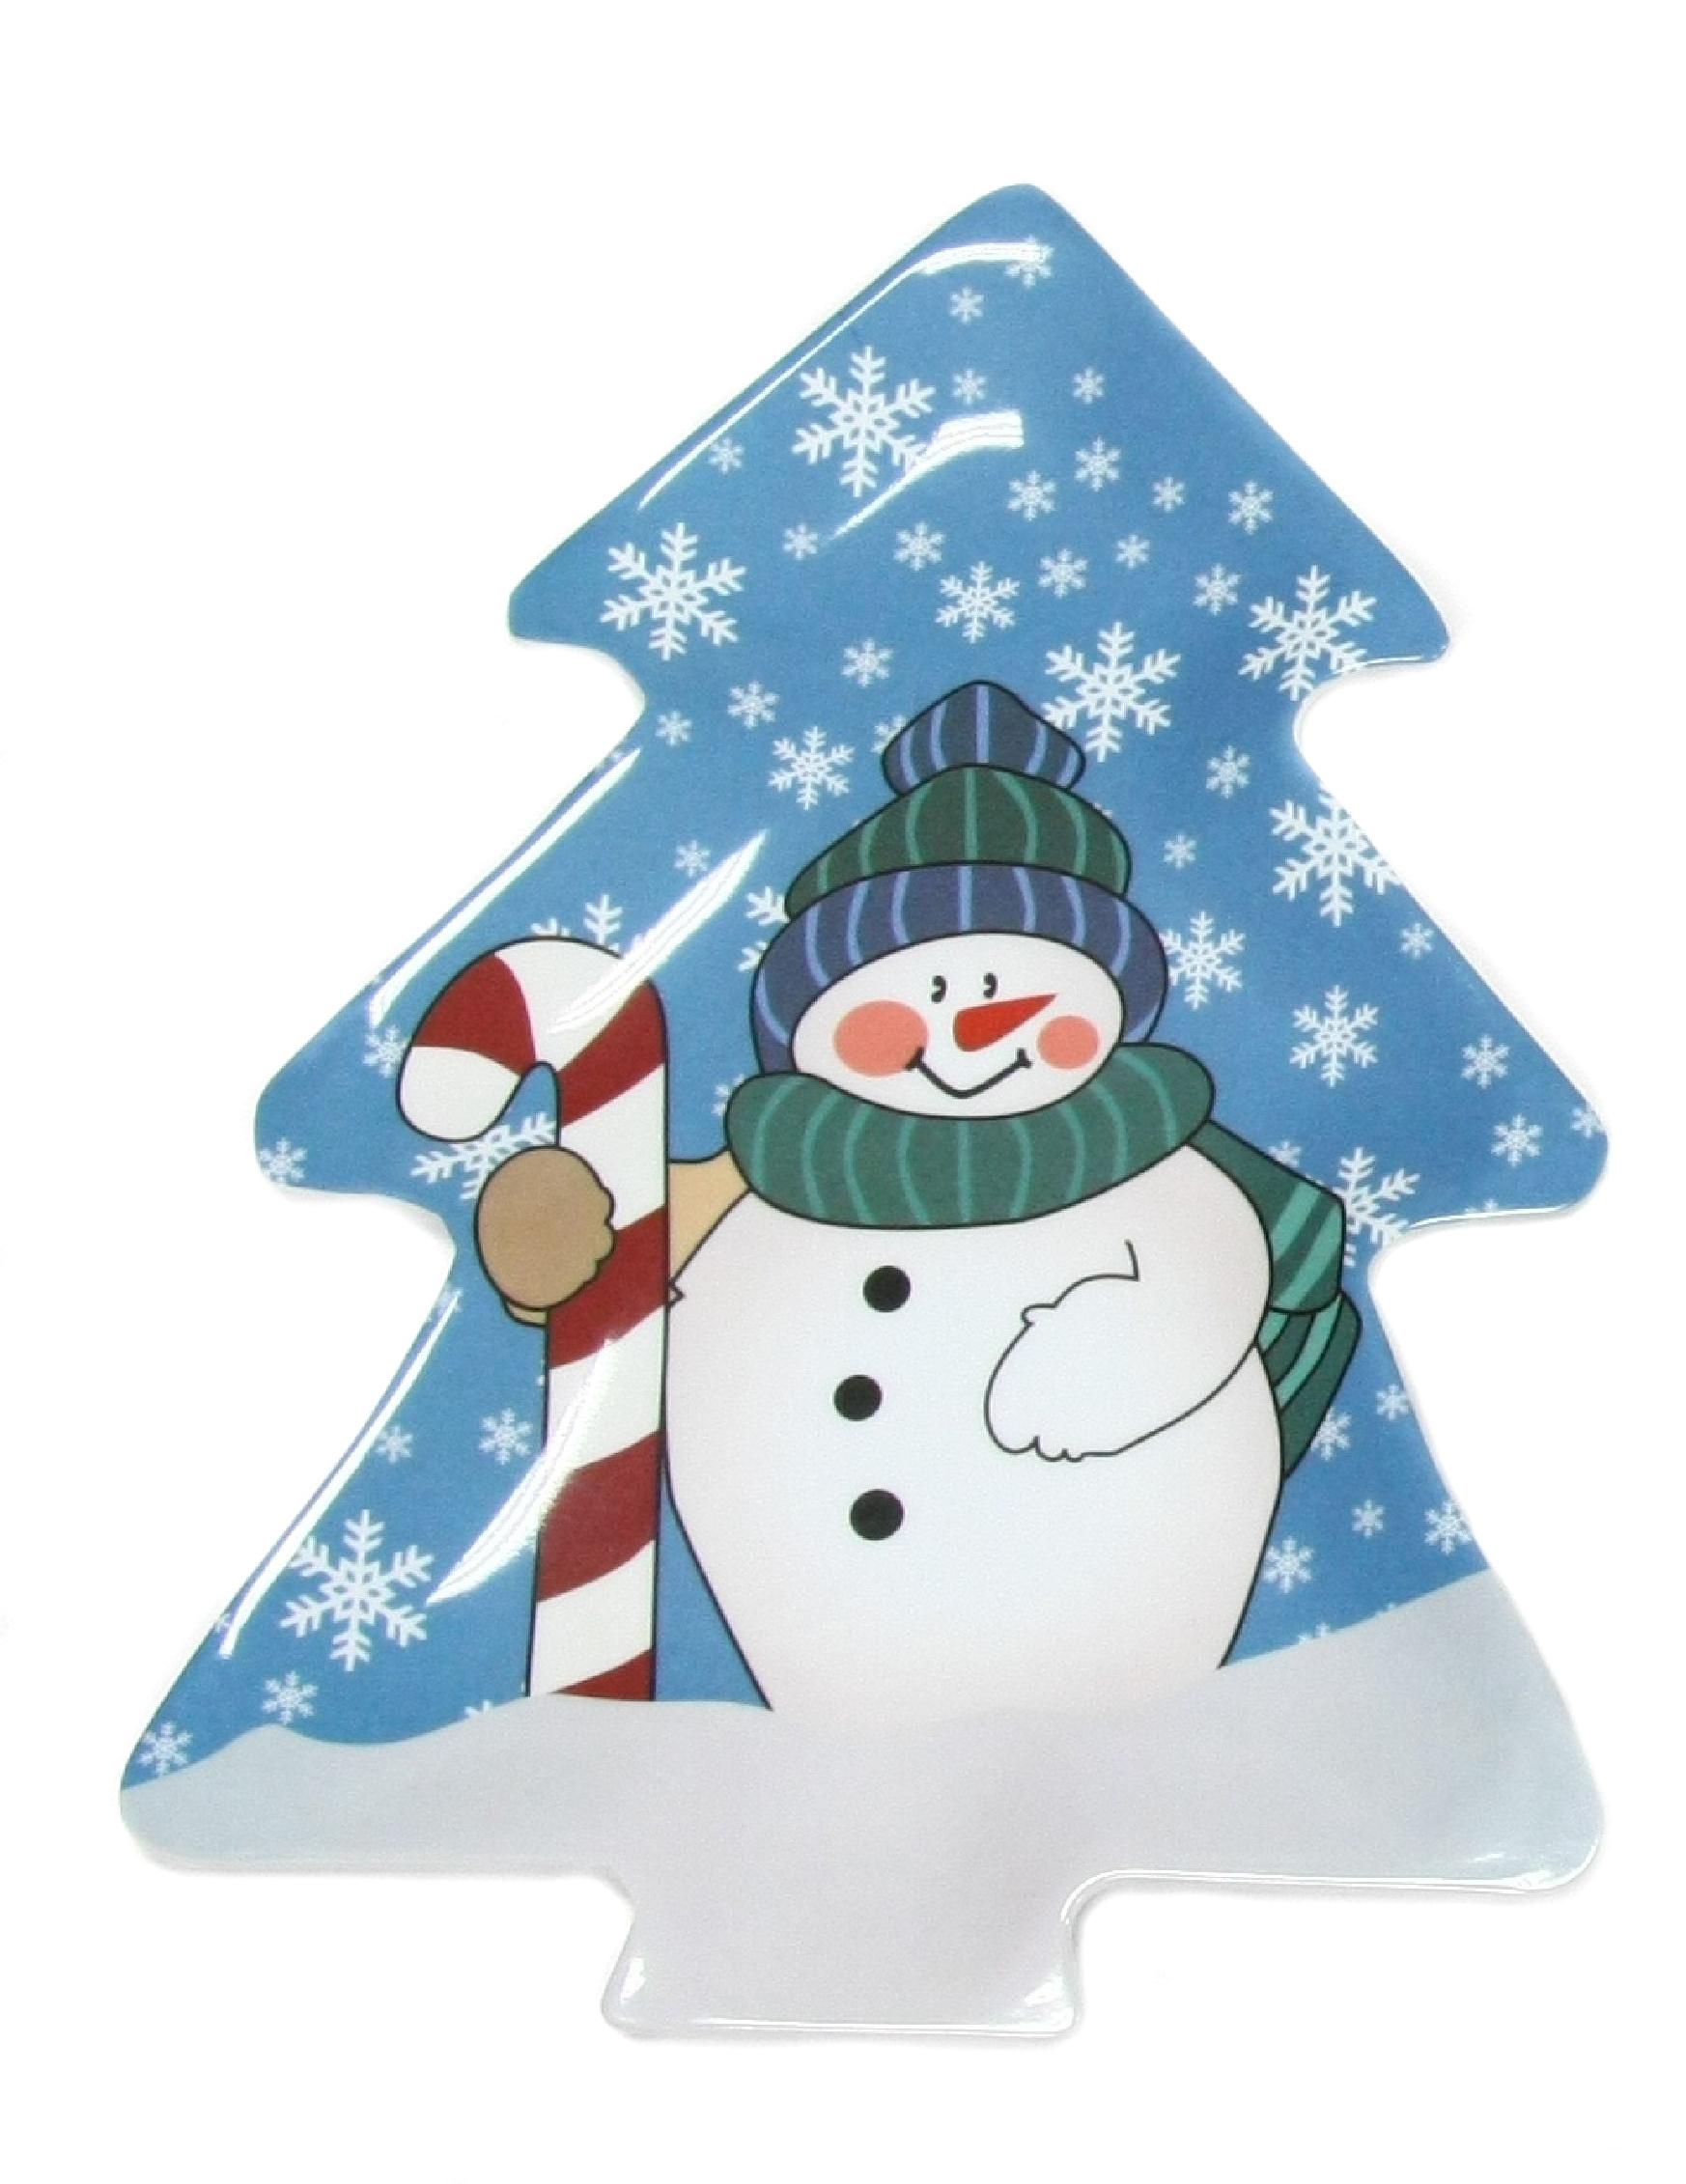 Modern Christmas Tree Shaped Snowman 12 5 Serving Platter Blue White Walmart Com Walmart Com